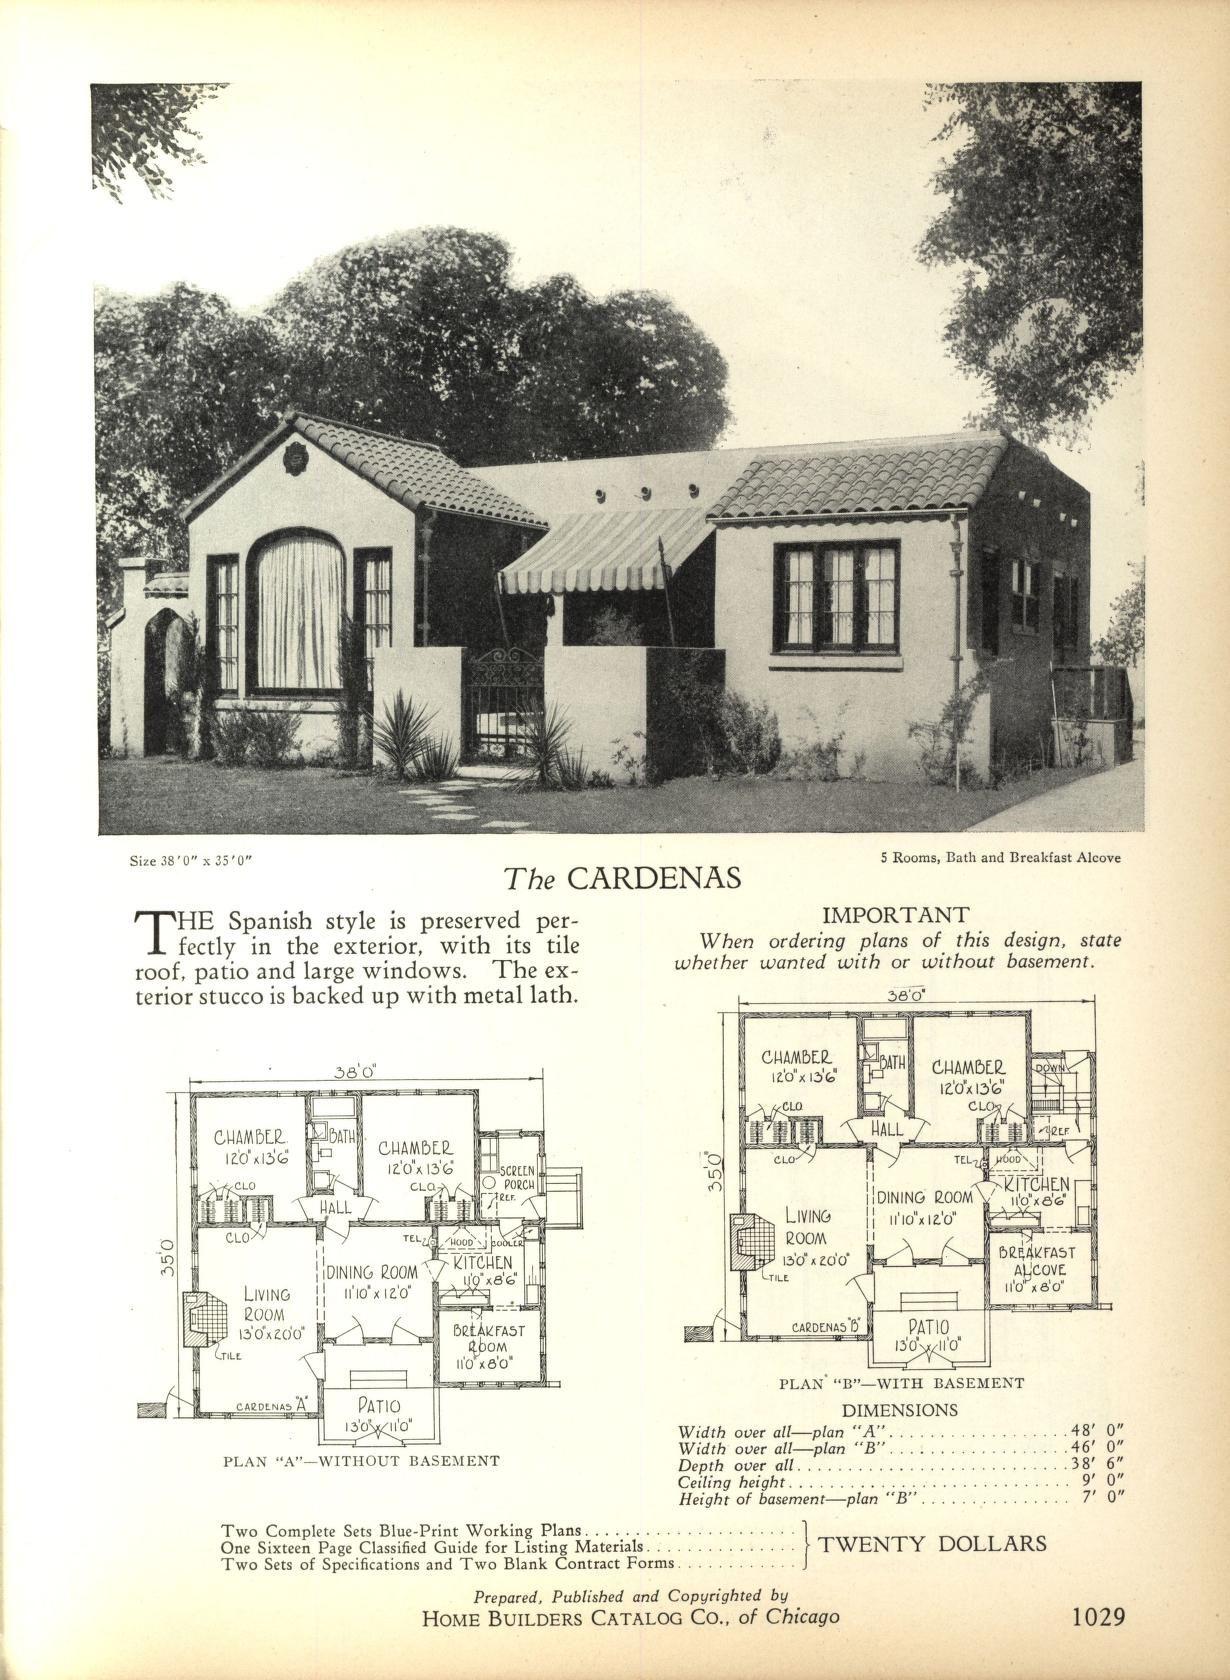 Http Www Artdecoresource Com 2014 01 Even More Art Deco House Plans Html Spanish Style Homes Bungalow Floor Plans Spanish Bungalow